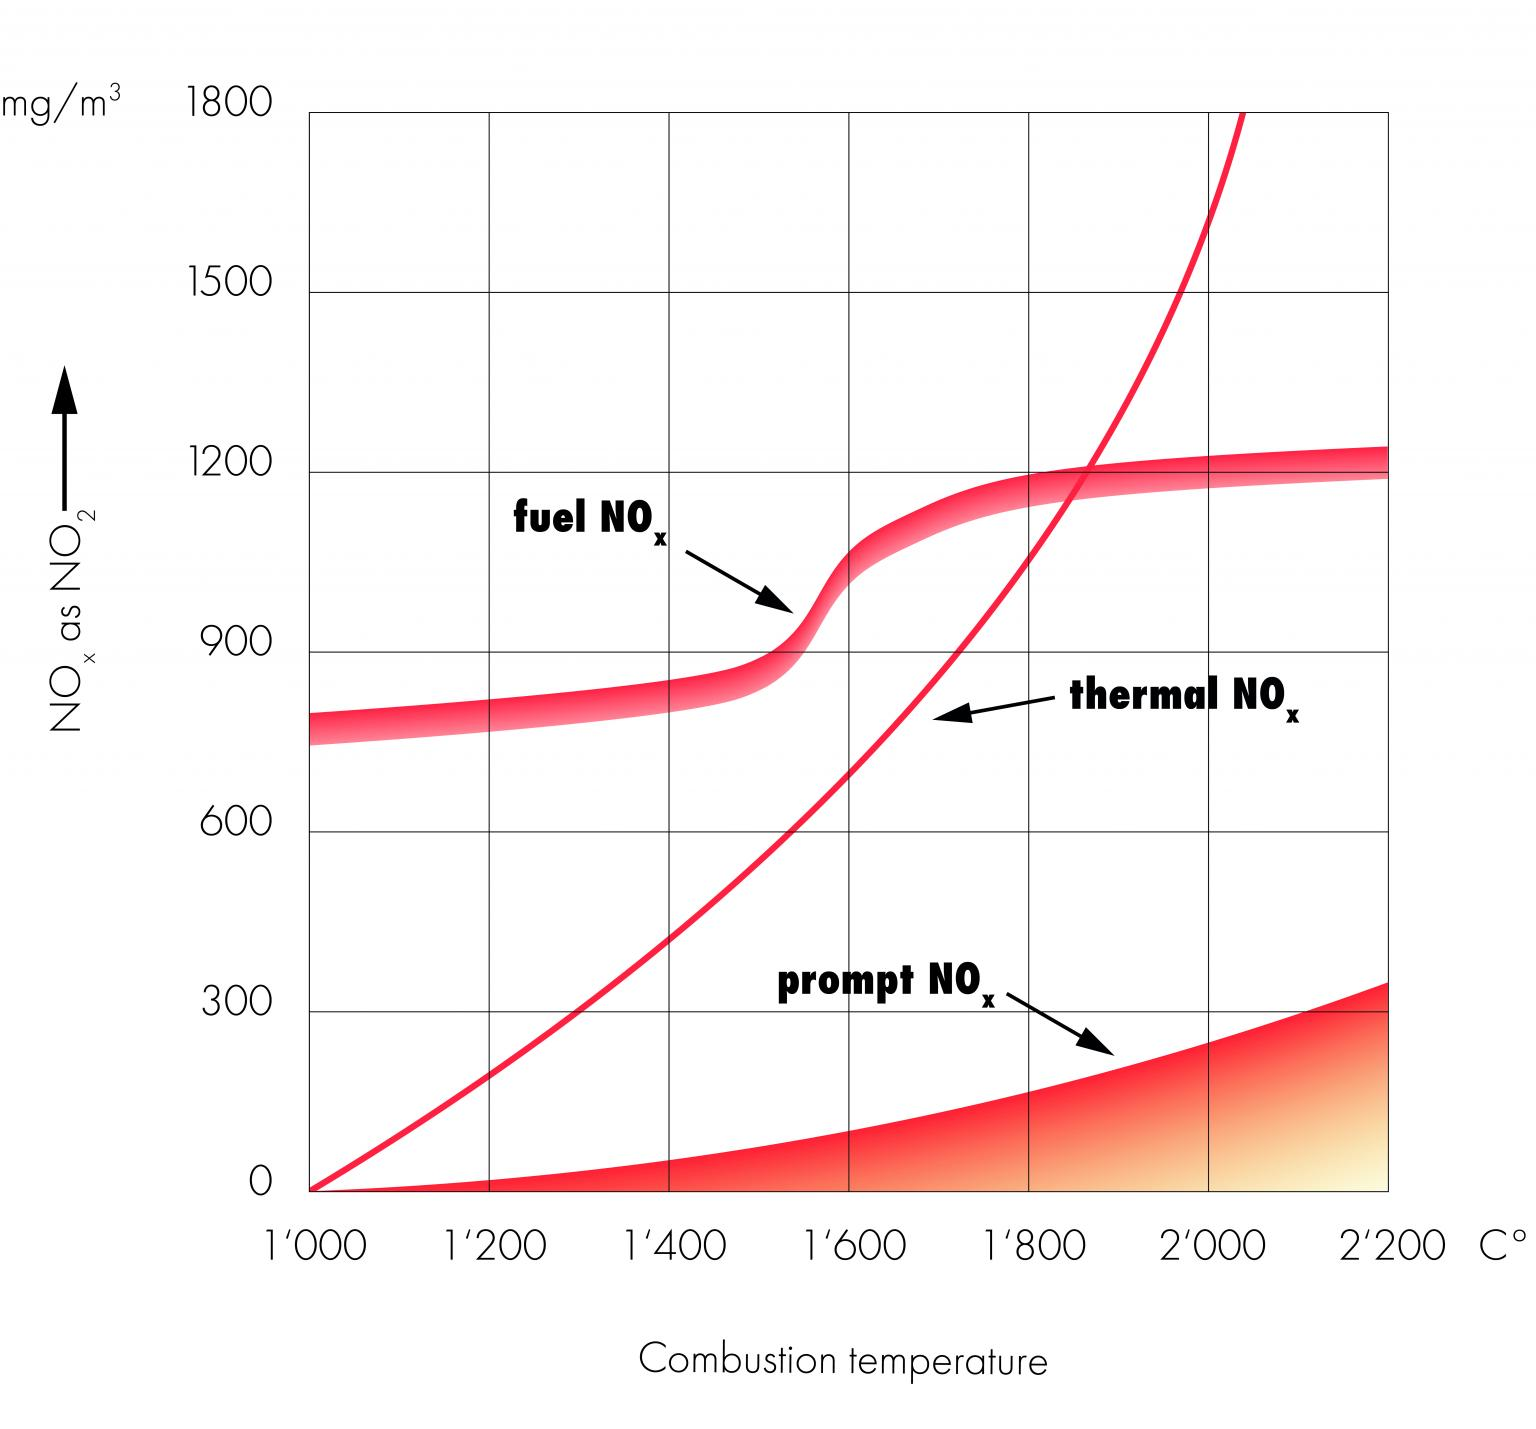 Influence of temperature on NOx formation (Rents, Nunge, Laforsch, Holtmann,1999)